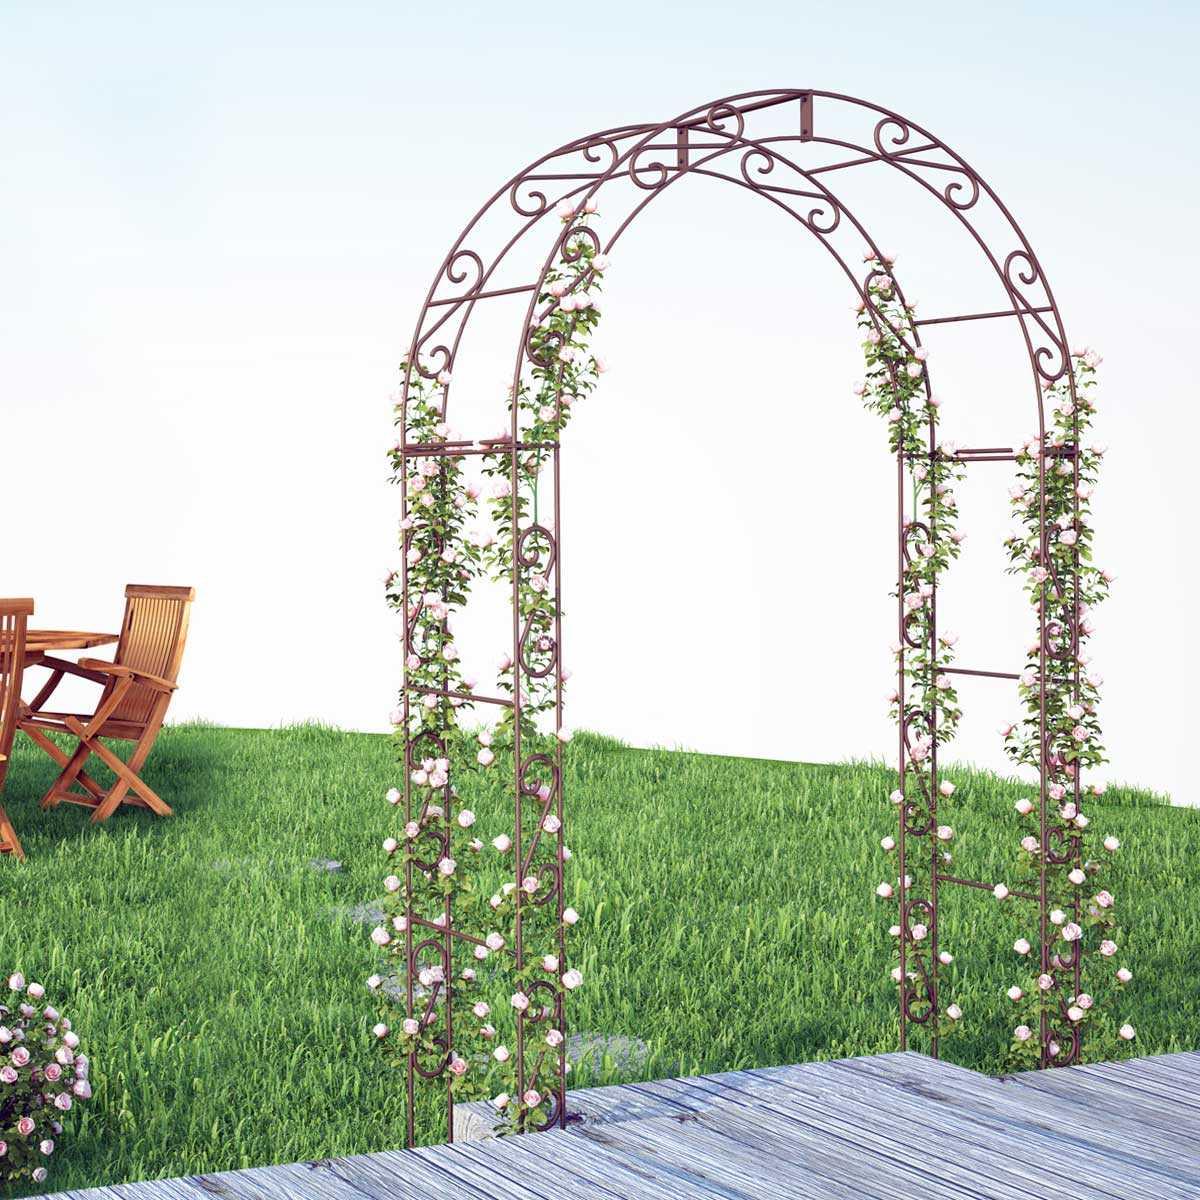 arche de jardin arrondie en acier plein vente au meilleur prix jardins animes